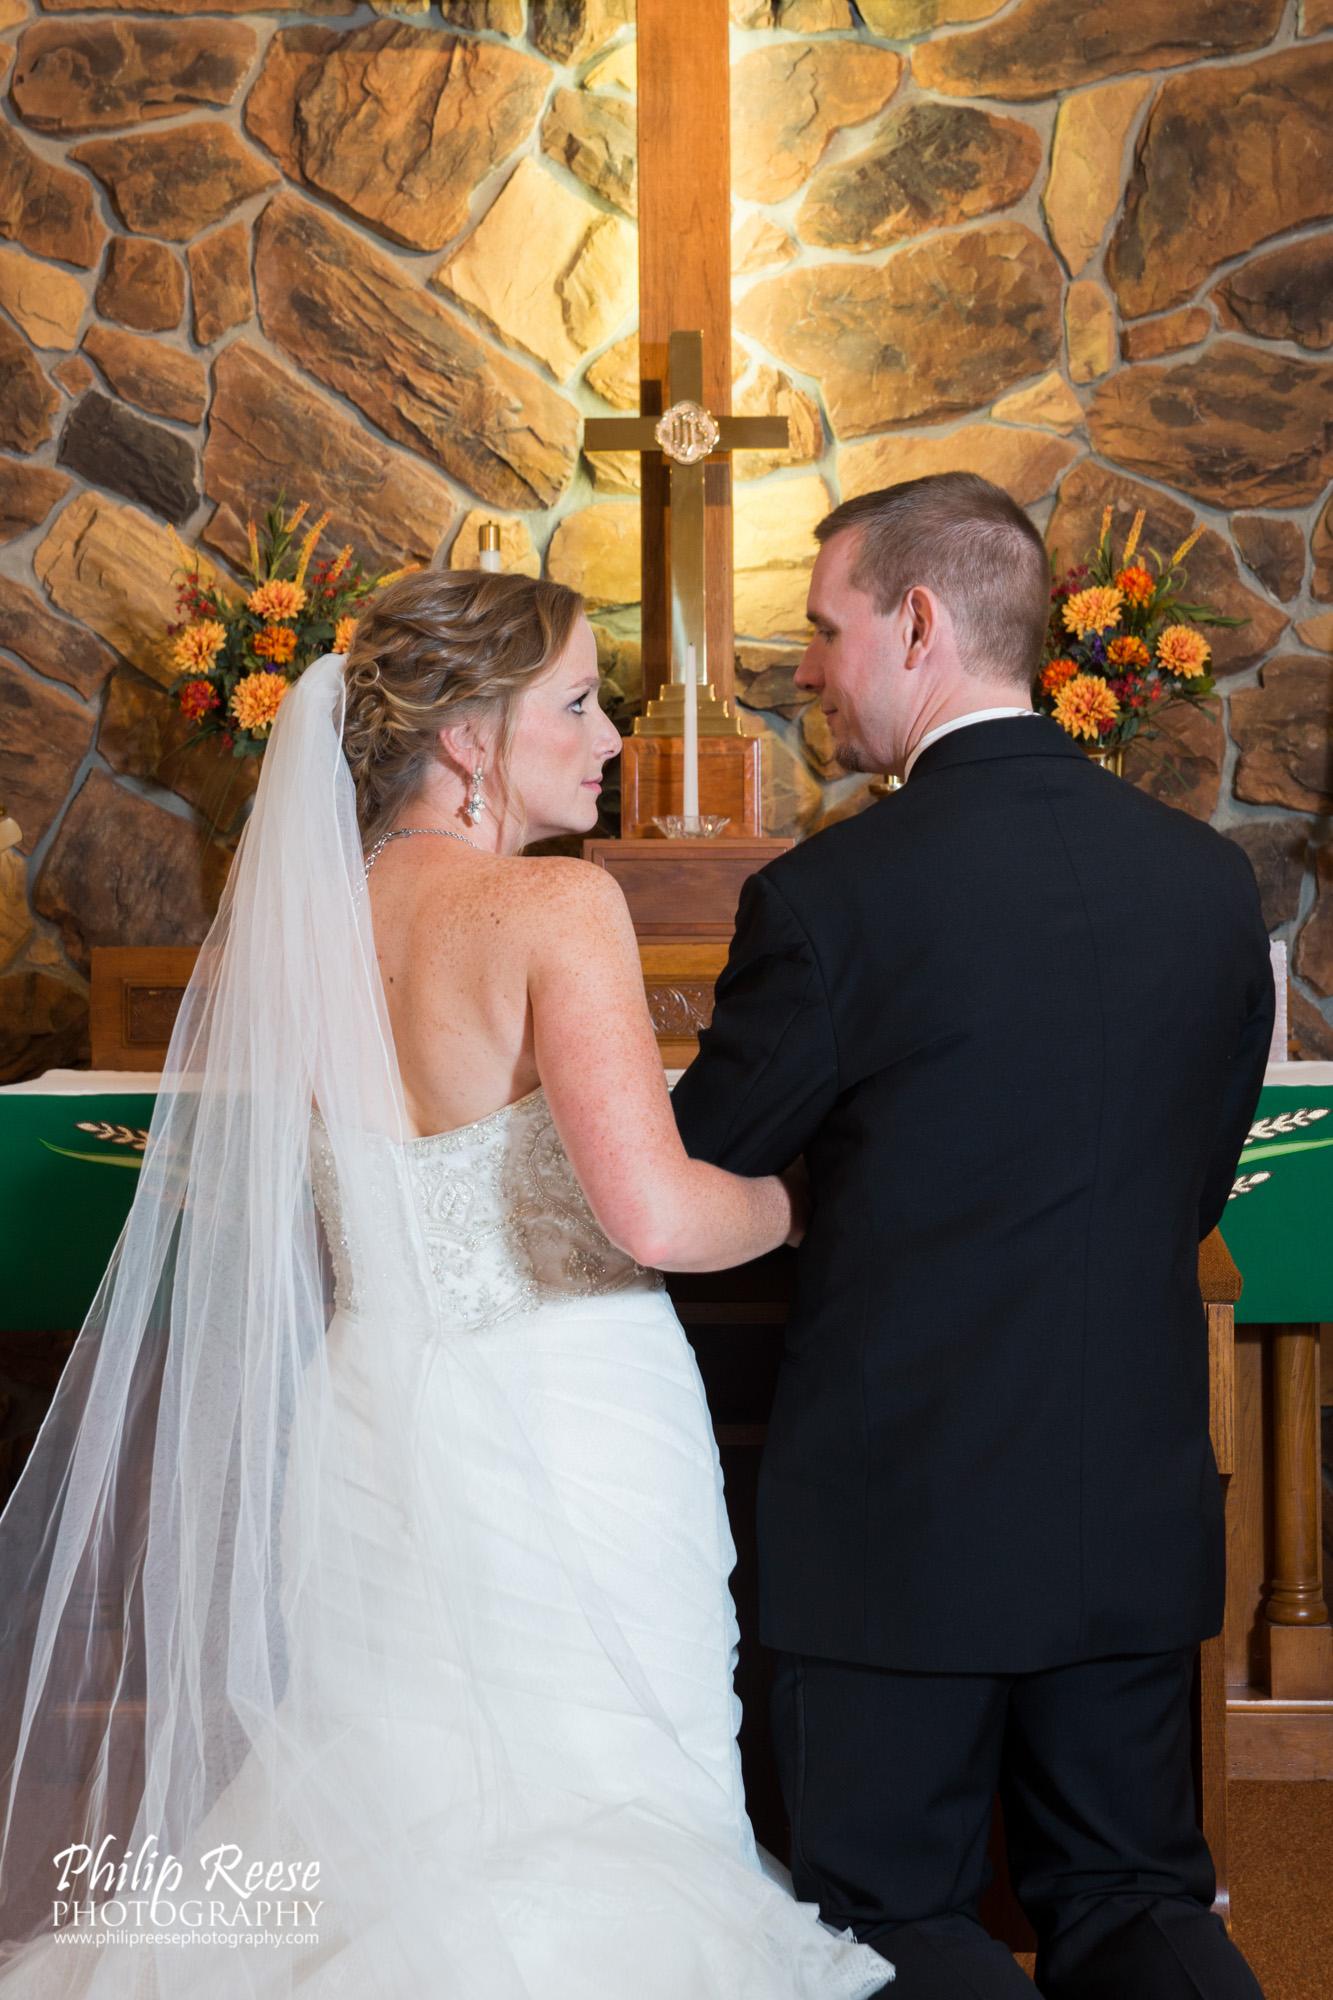 Bruder Wedding 106 - 06184.jpg